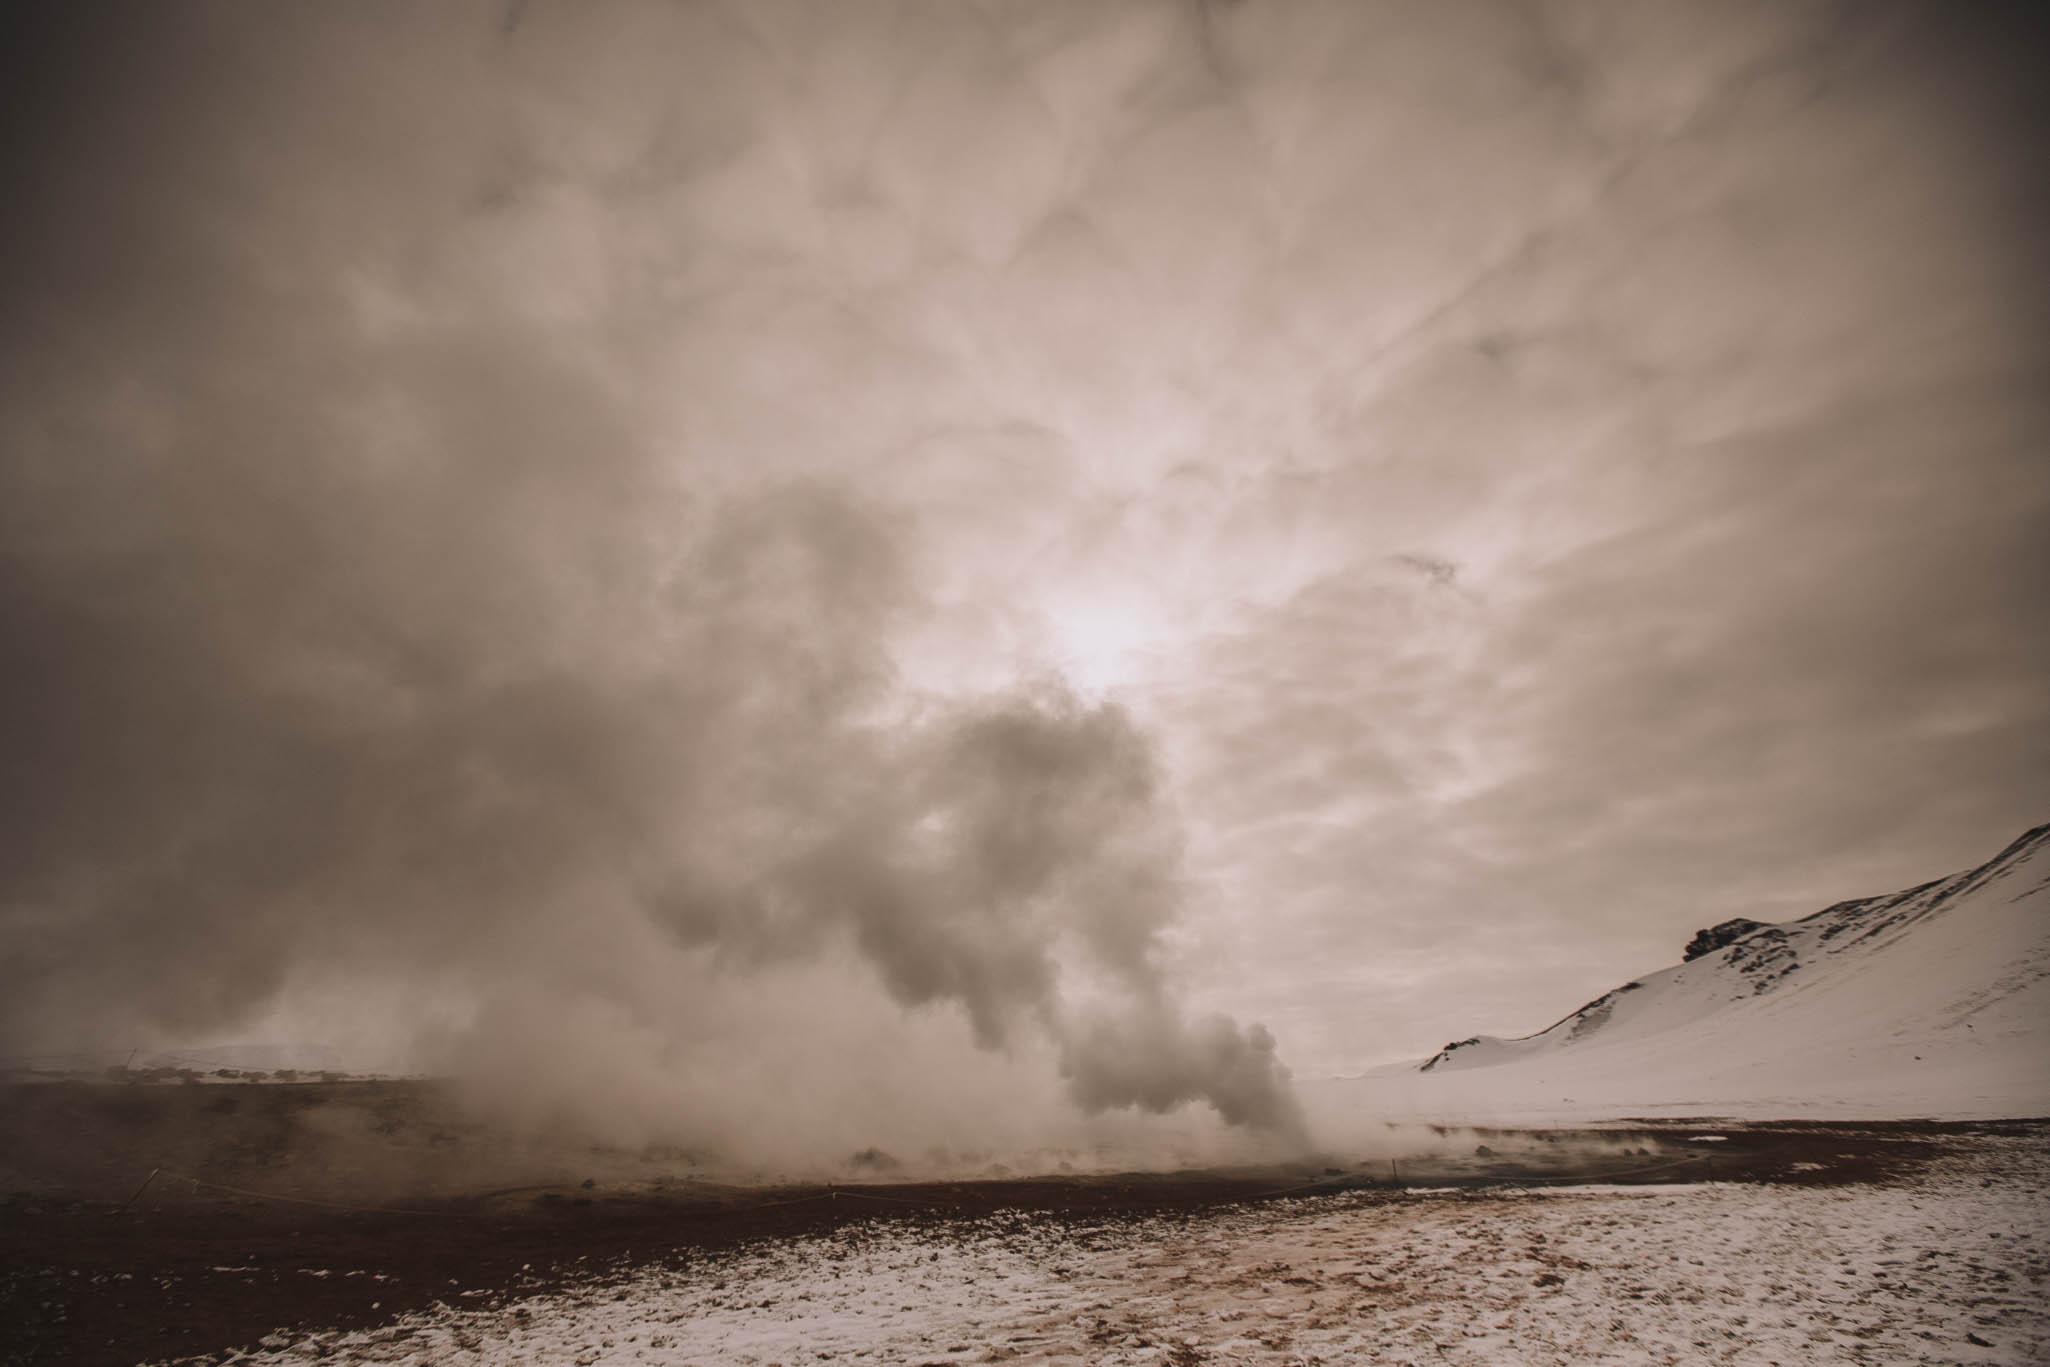 Road-trip-Islande-Iceland-Voyage-Travel-Portrait-Jérémy-Boyer-Hverir-Steam-mountains-montagnes-vapeur-10.jpg